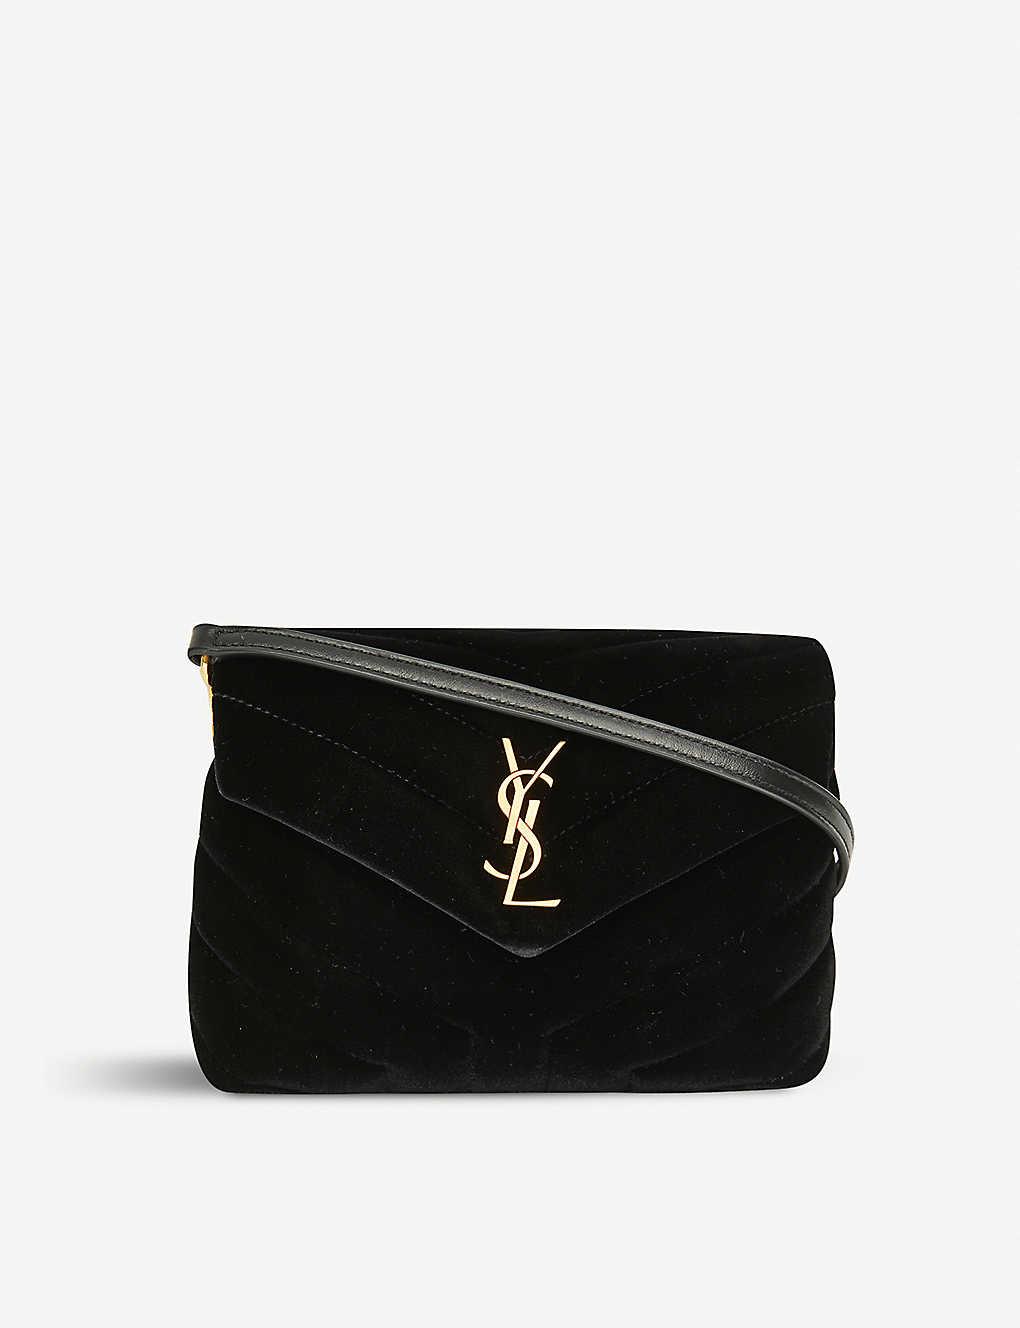 795d4c1bf3b SAINT LAURENT - Toy Loulou velvet shoulder bag | Selfridges.com